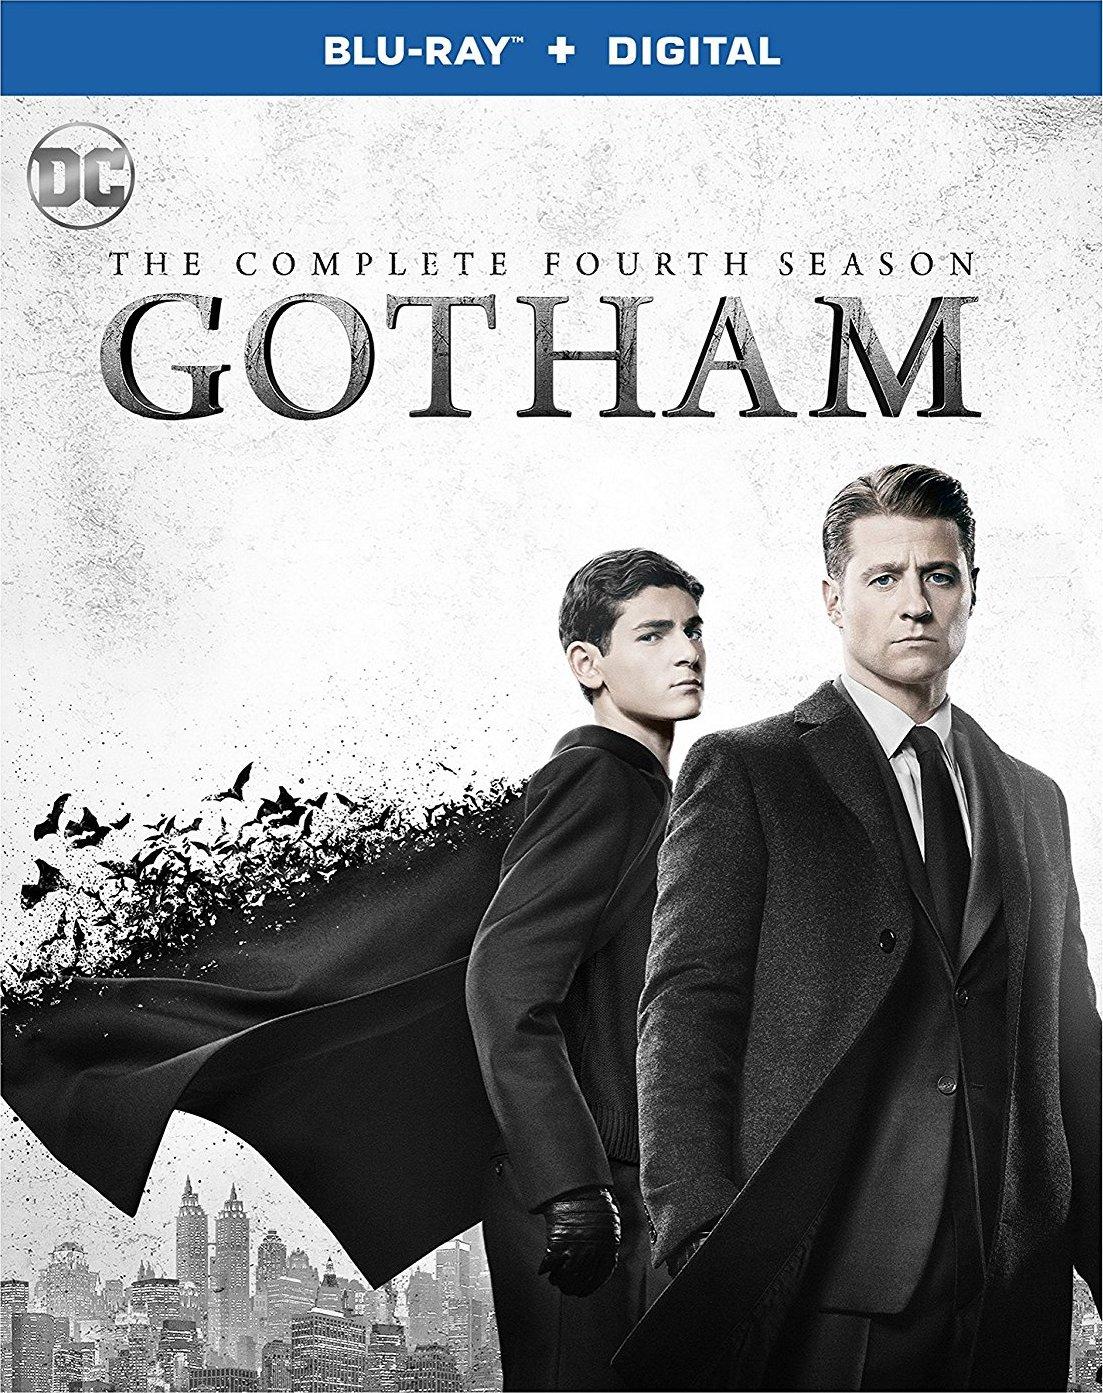 Gotham: The Complete Fourth Season (TV) (2017) Blu-ray